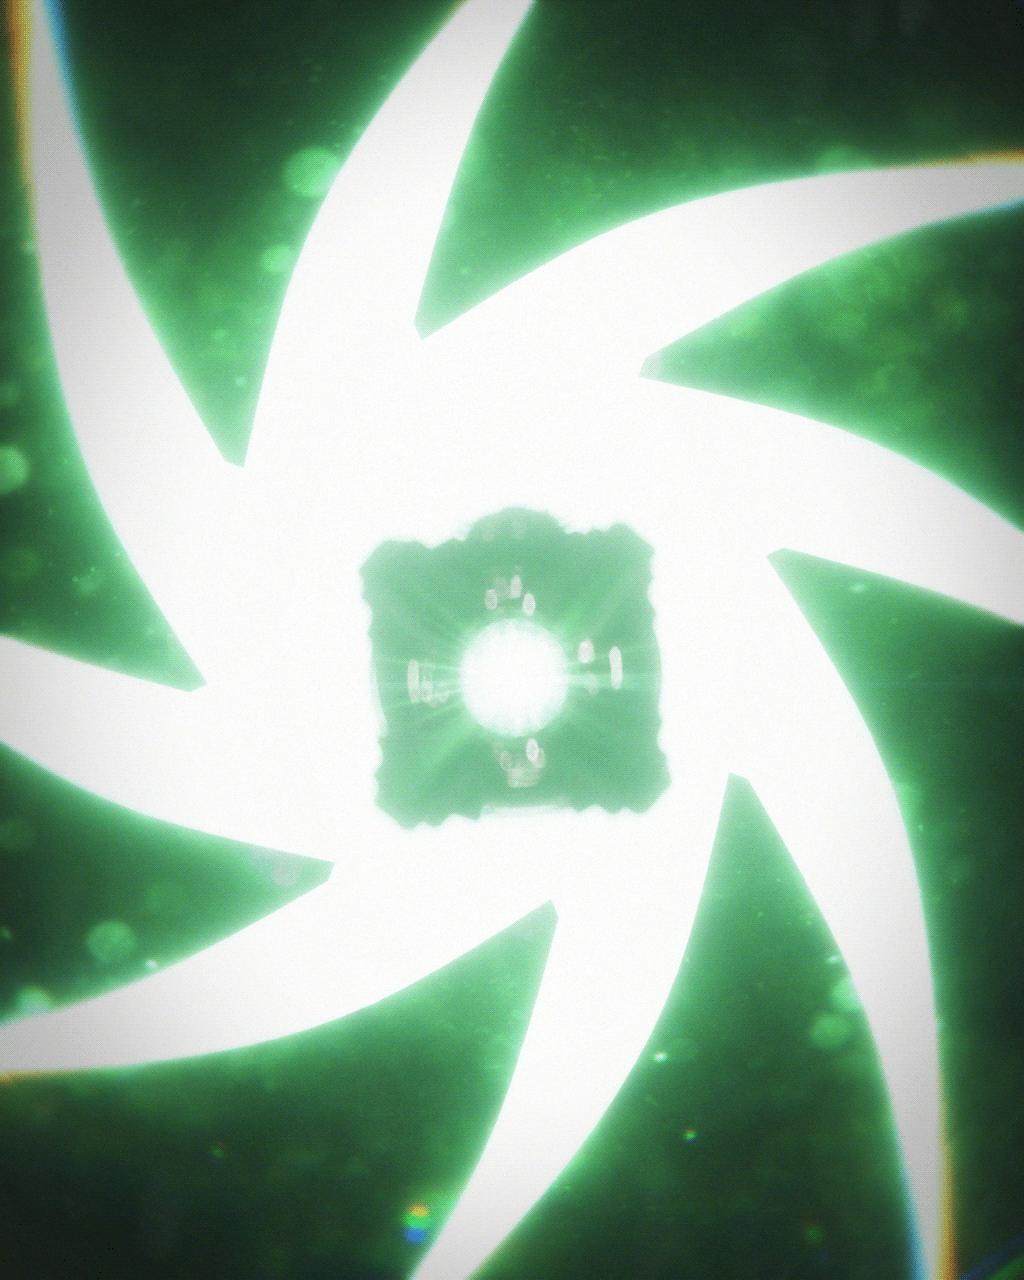 Image may contain: green